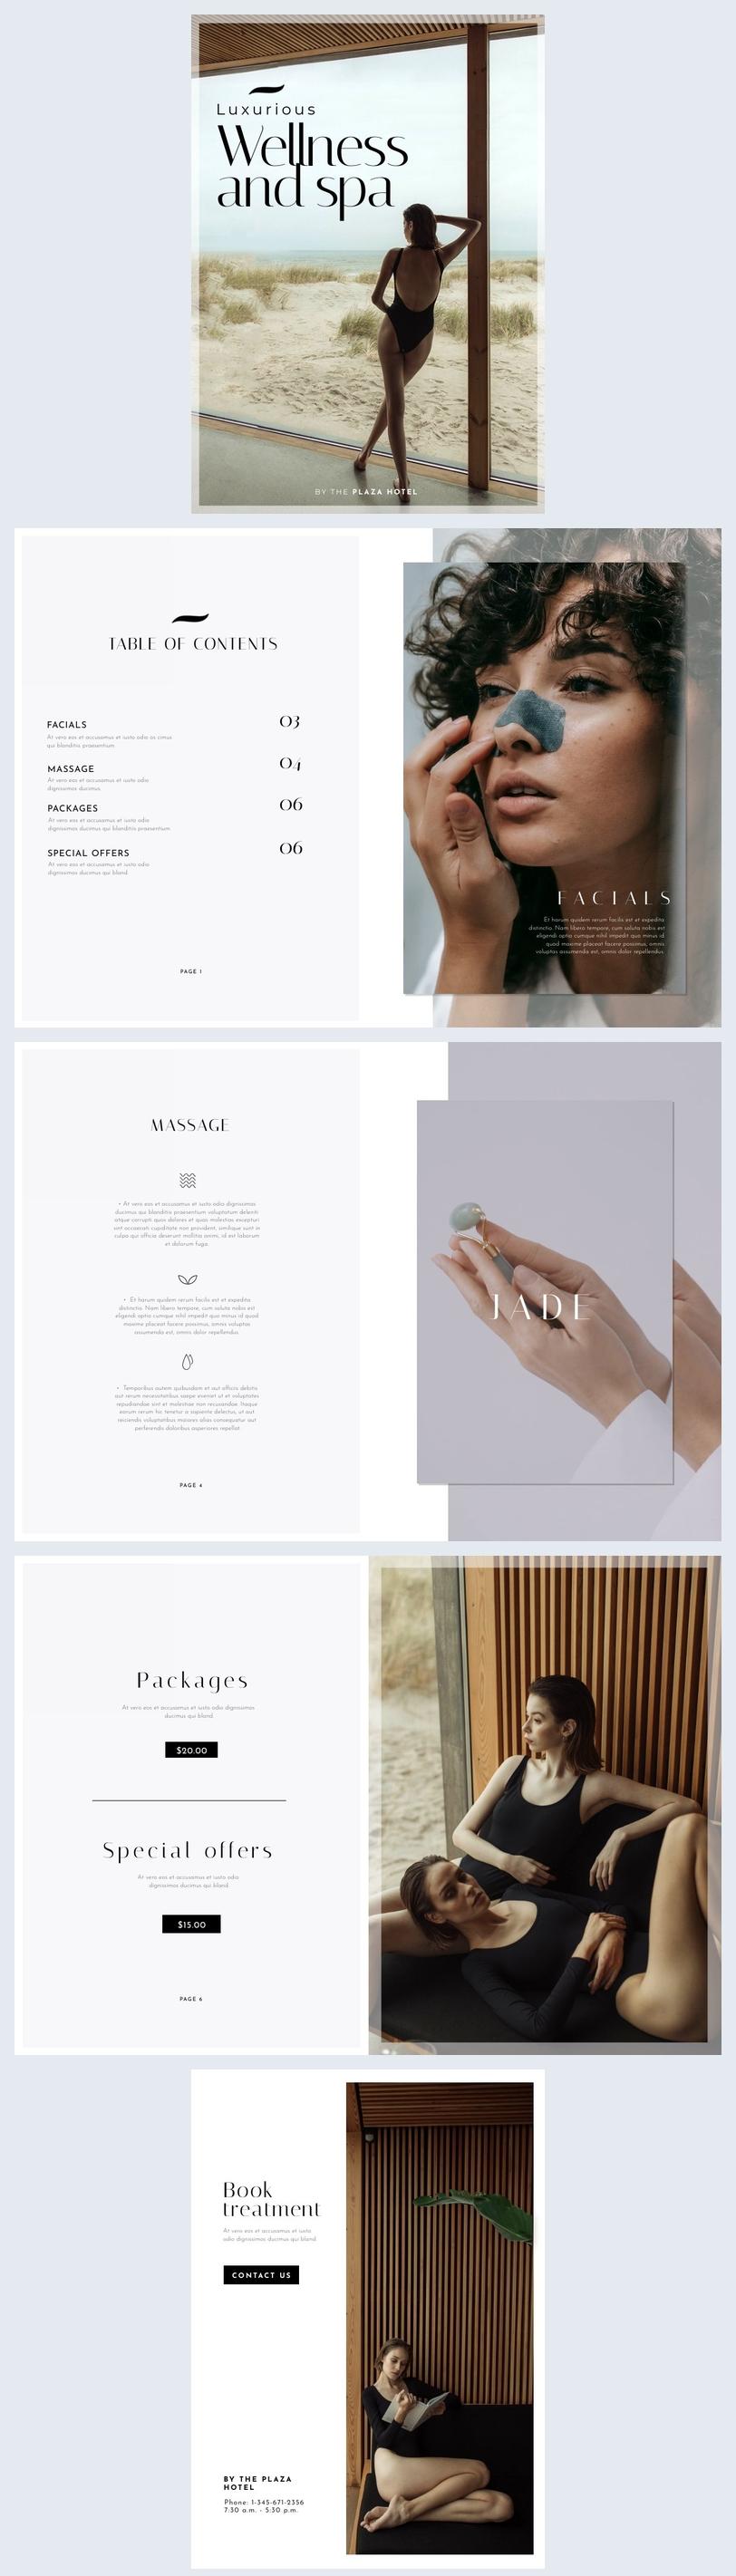 Free Online Lookbook Design Sample